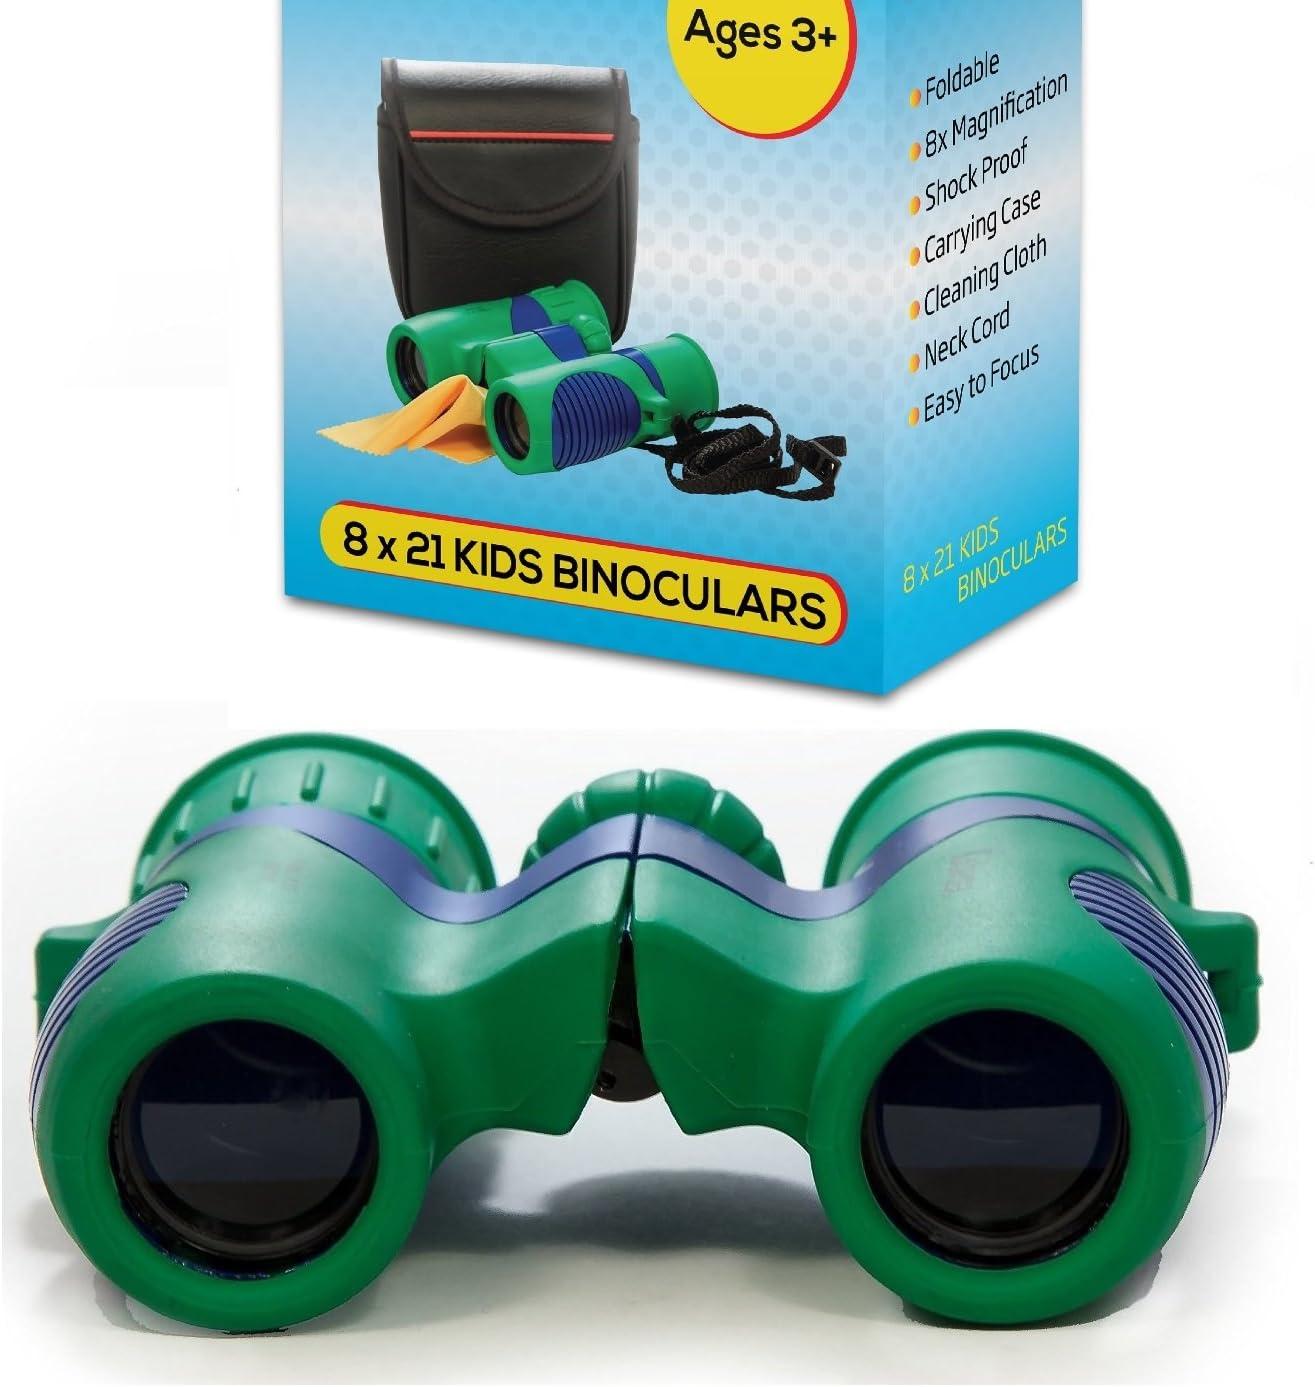 Kidwinz Original Compact 8x21 Alternative dealer Kids Set - Selling rankings Resolut Binoculars High